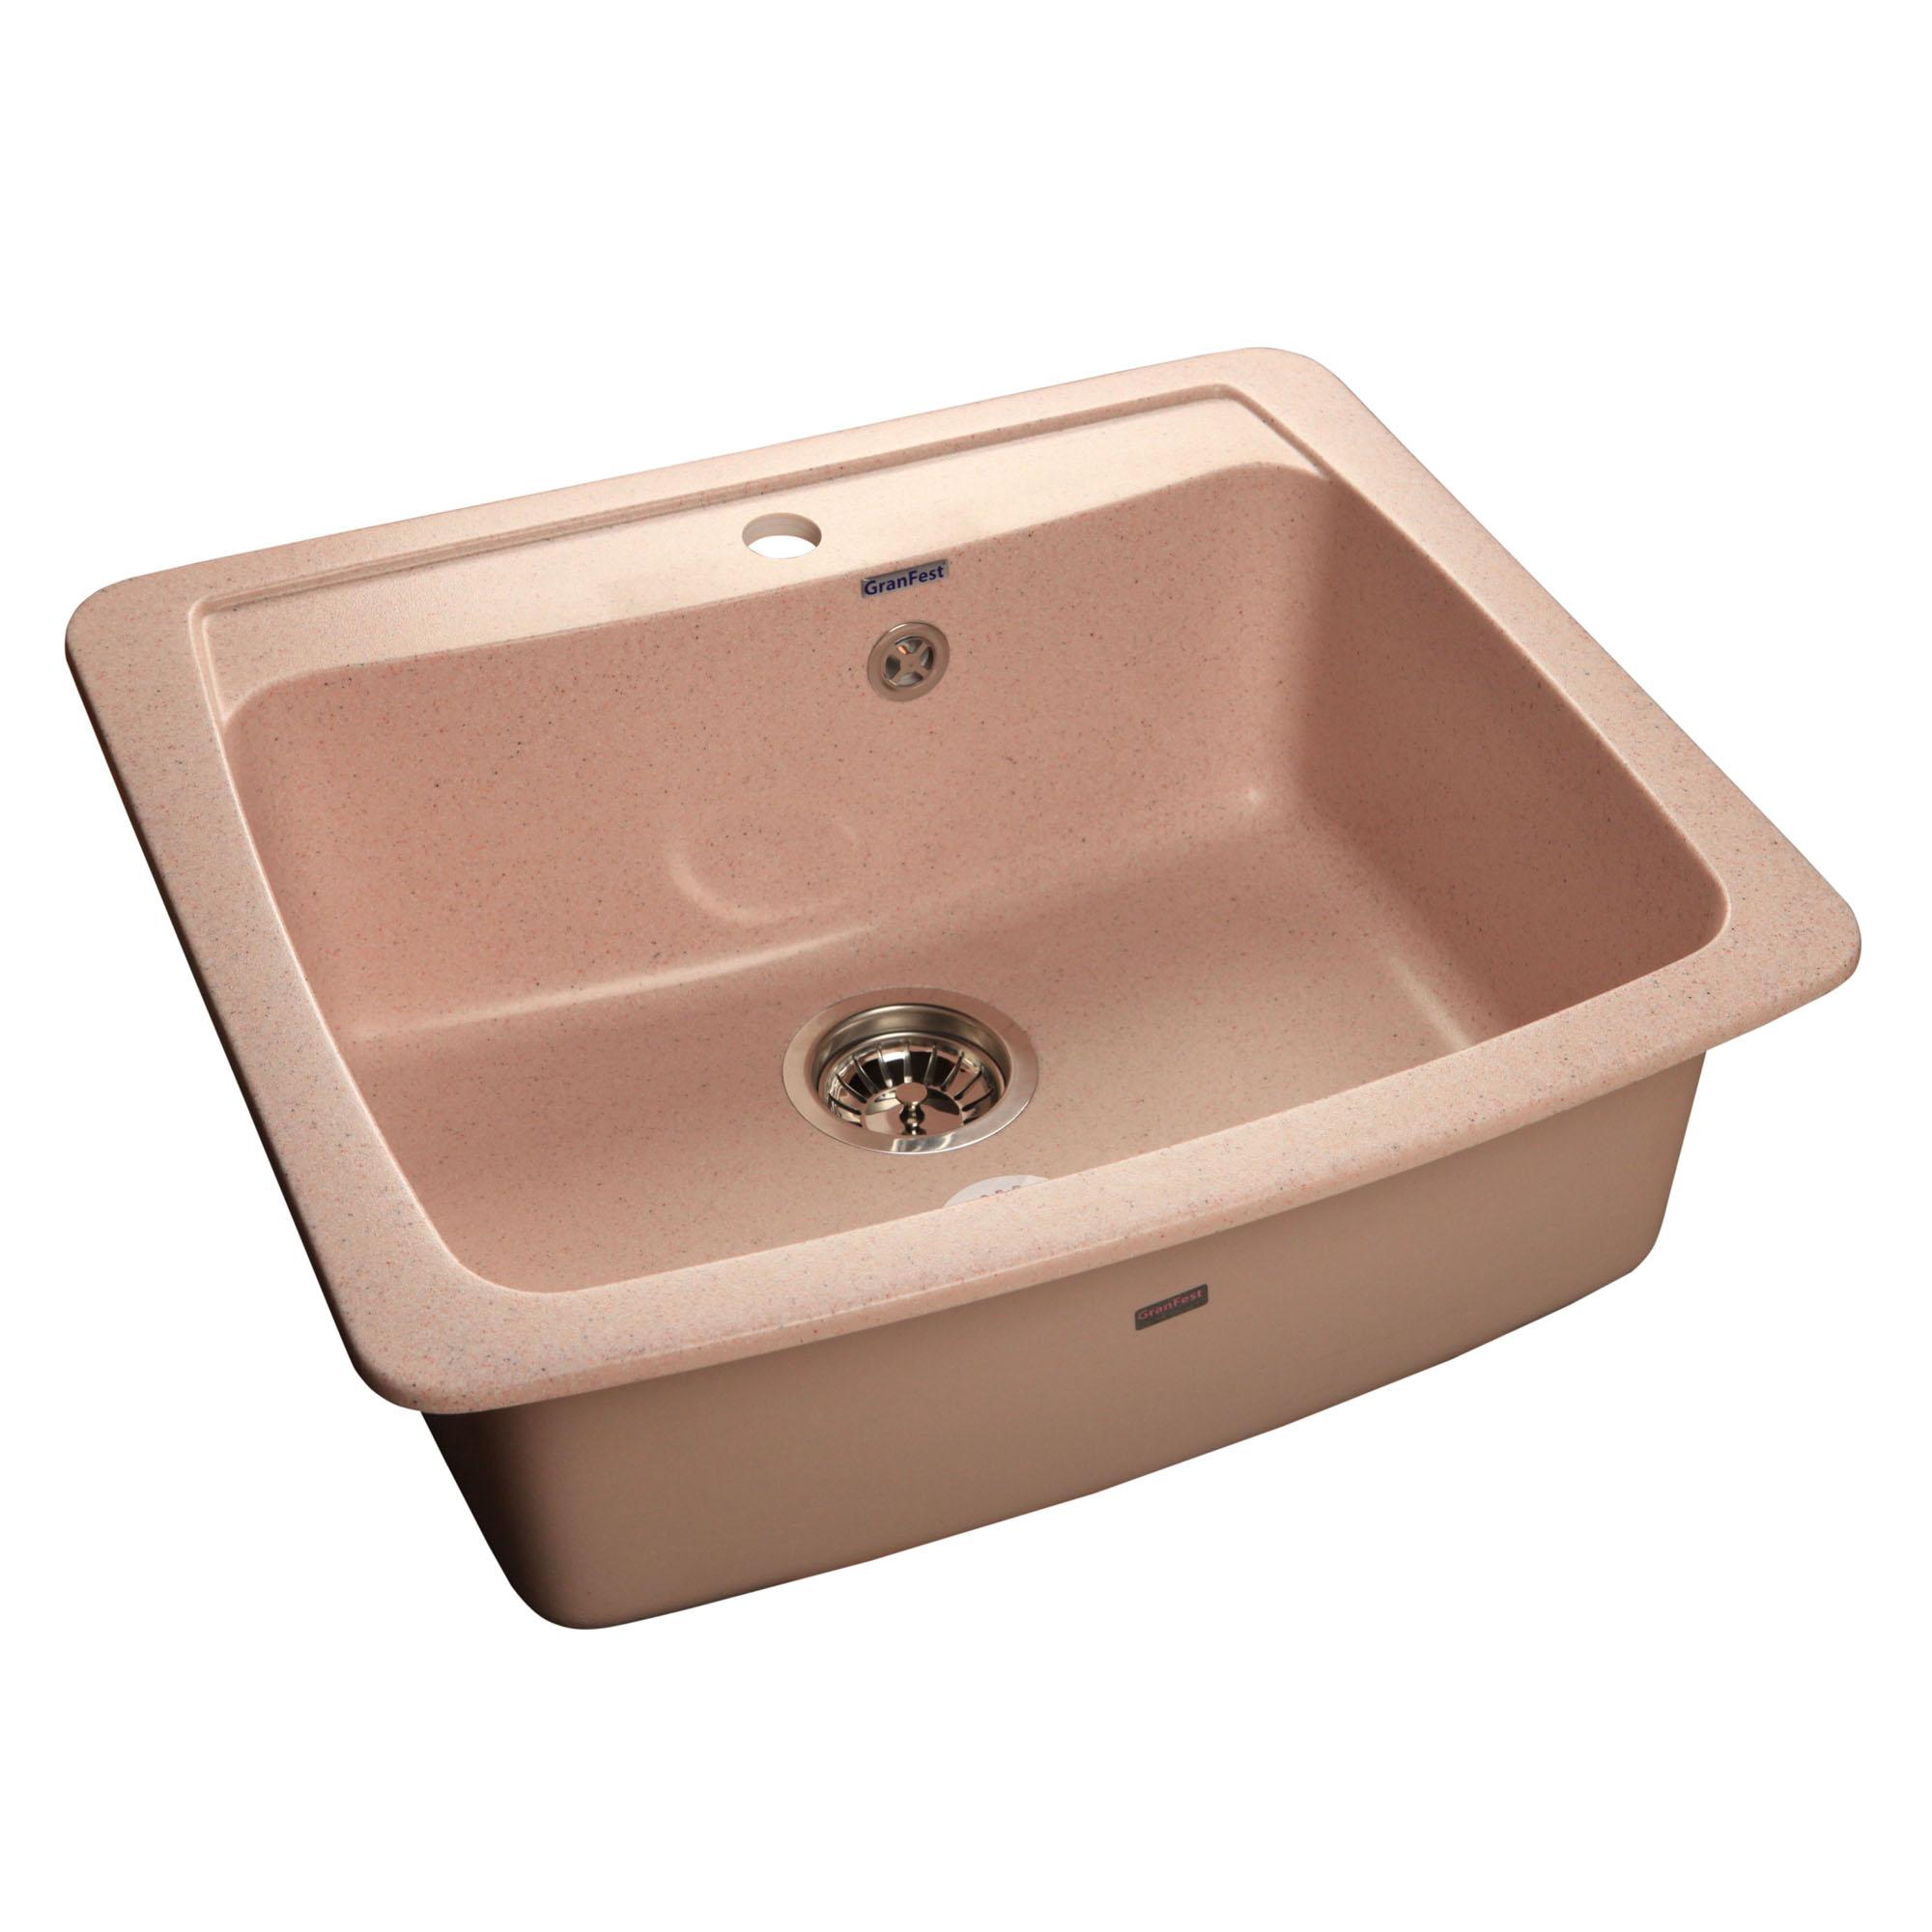 Кухонная мойка GranFest Standart GF-S605 розовый мойка кухонная granfest гранит 605x510 gf s605 бежевая